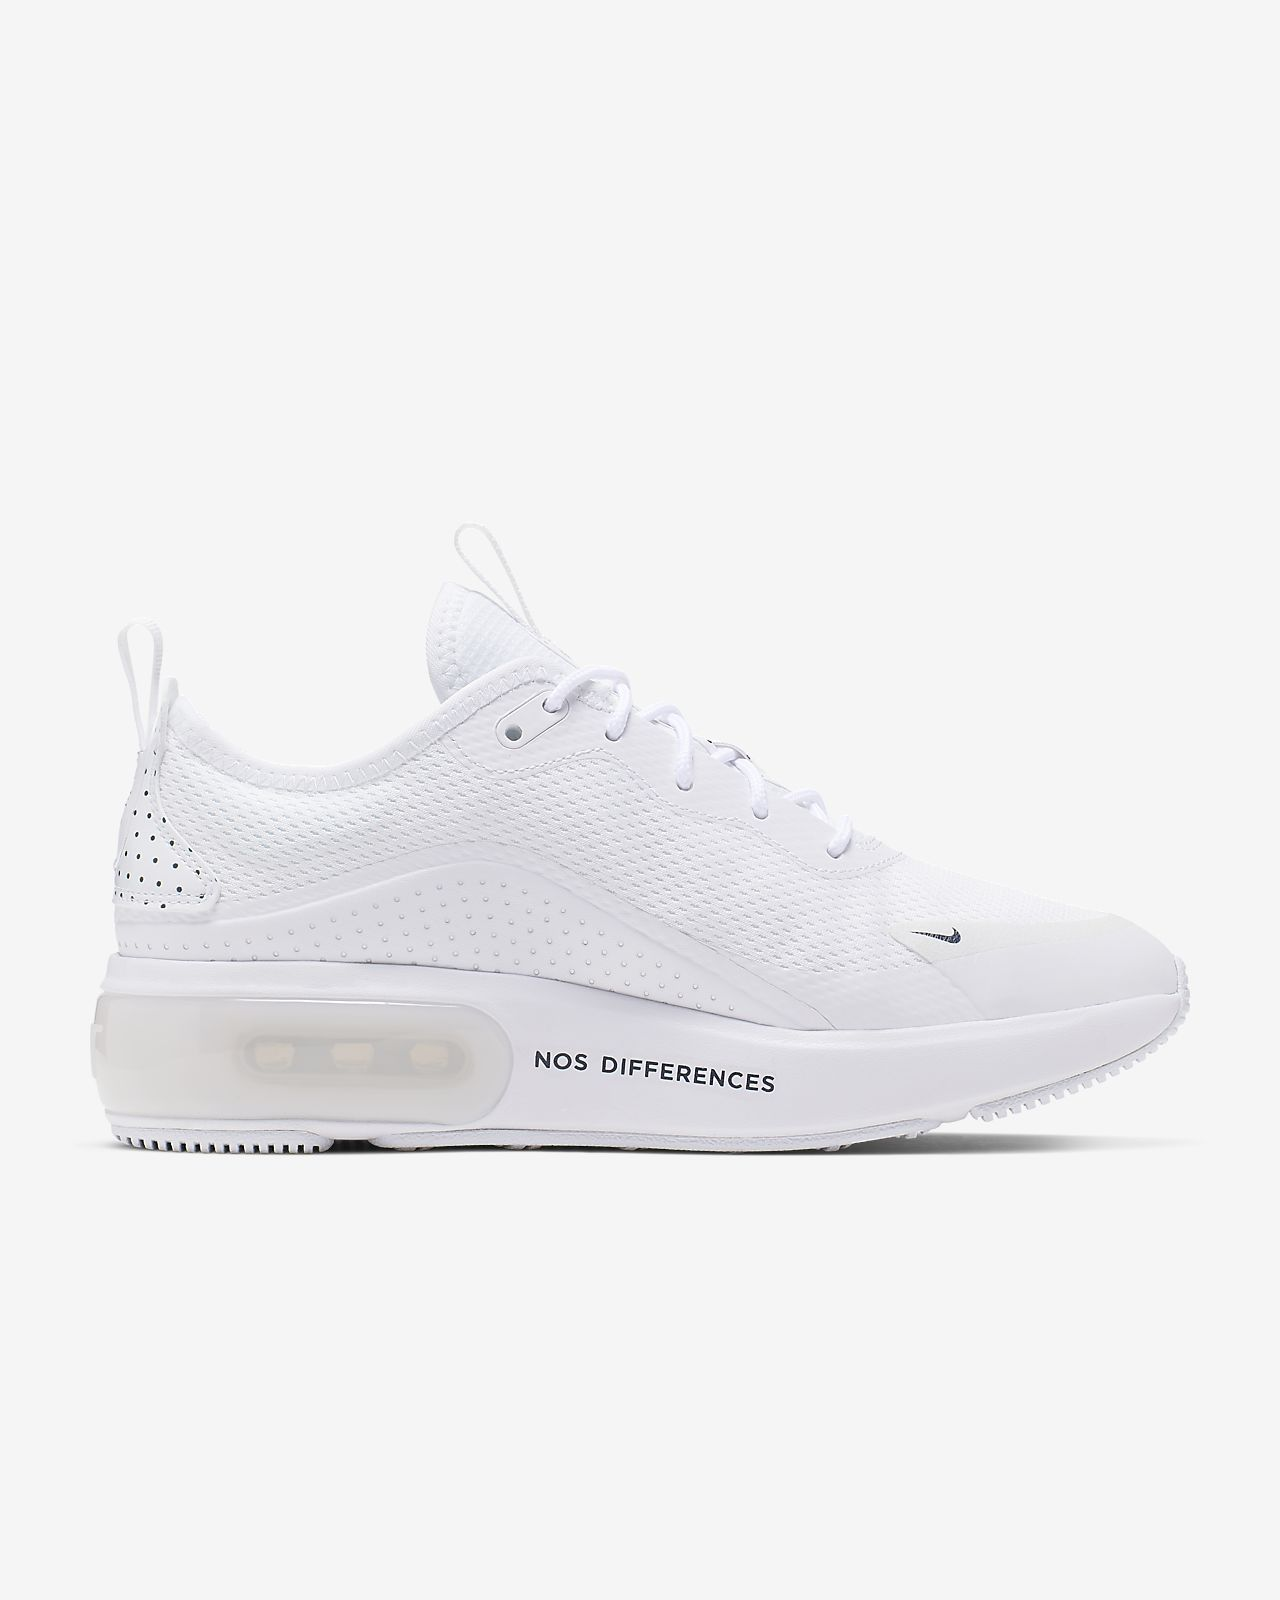 new style 953f4 cba20 ... Nike Air Max Dia SE Unité Totale Women s Shoe